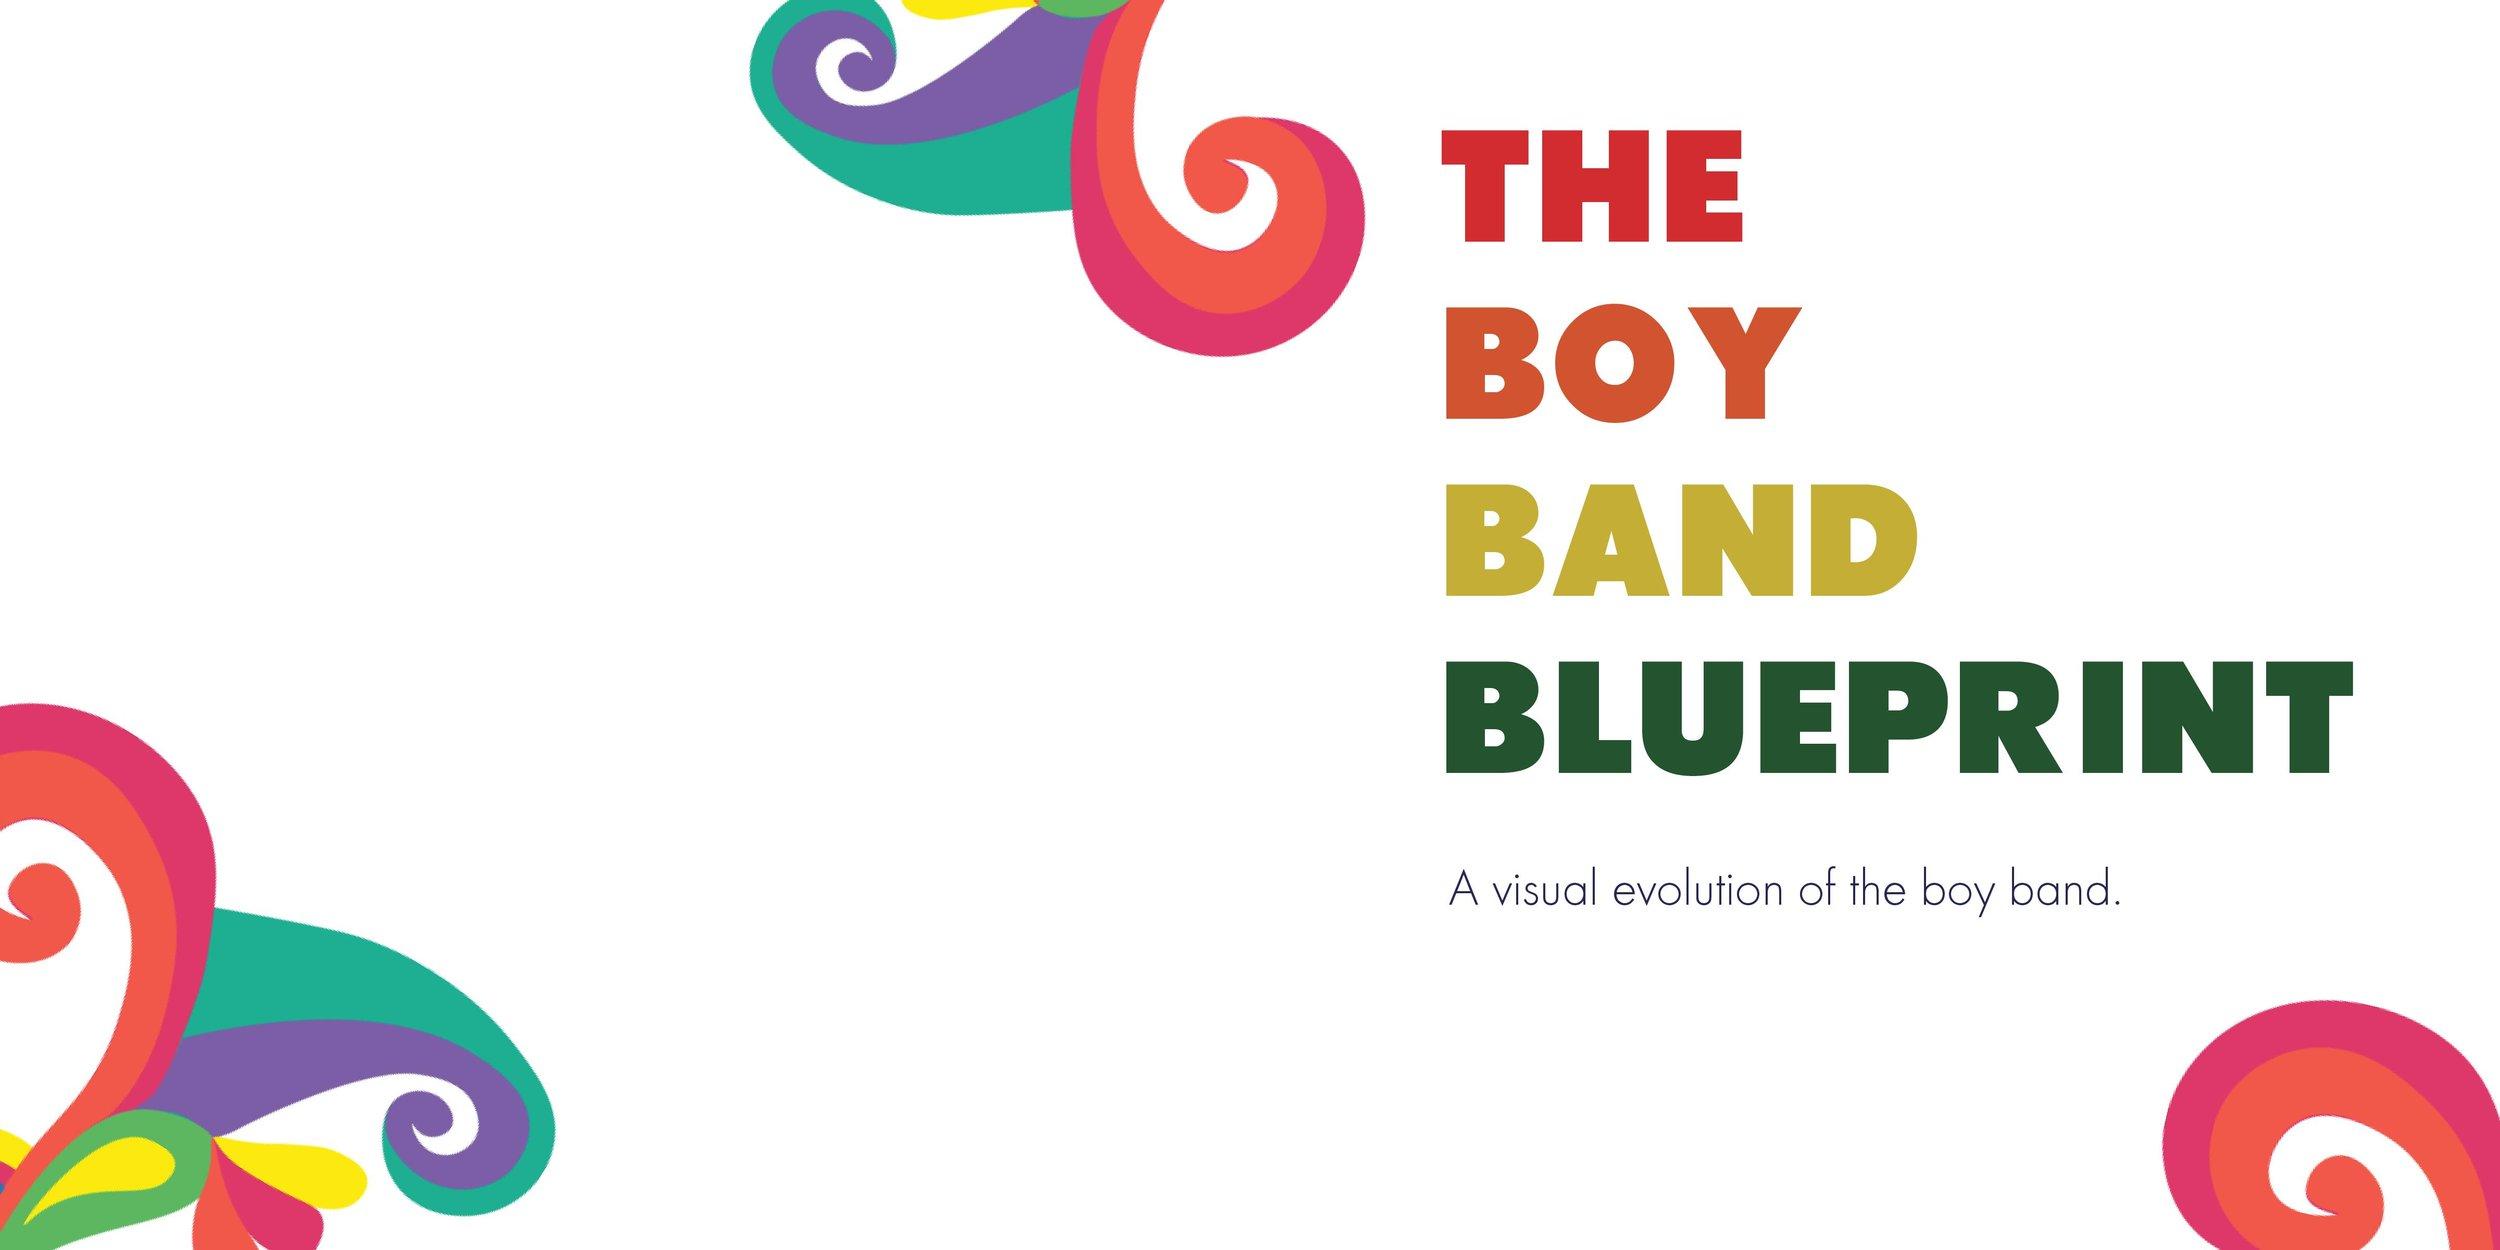 Boyband blueprint book project alaina brogan boyband blueprint book project malvernweather Image collections